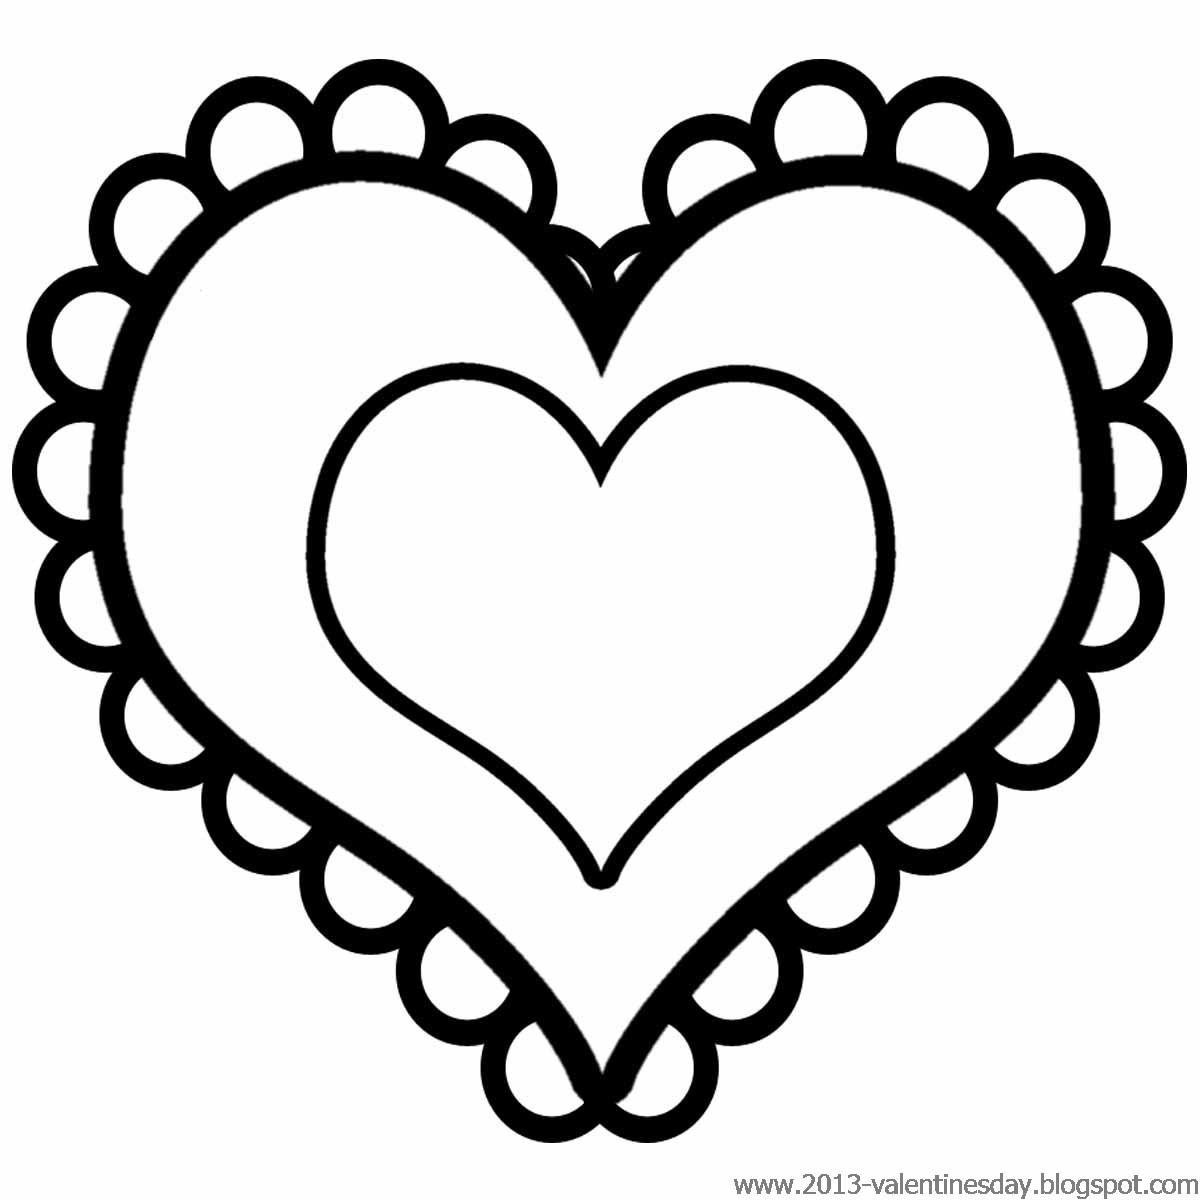 Heart Vector Black And White Heart Clip Art